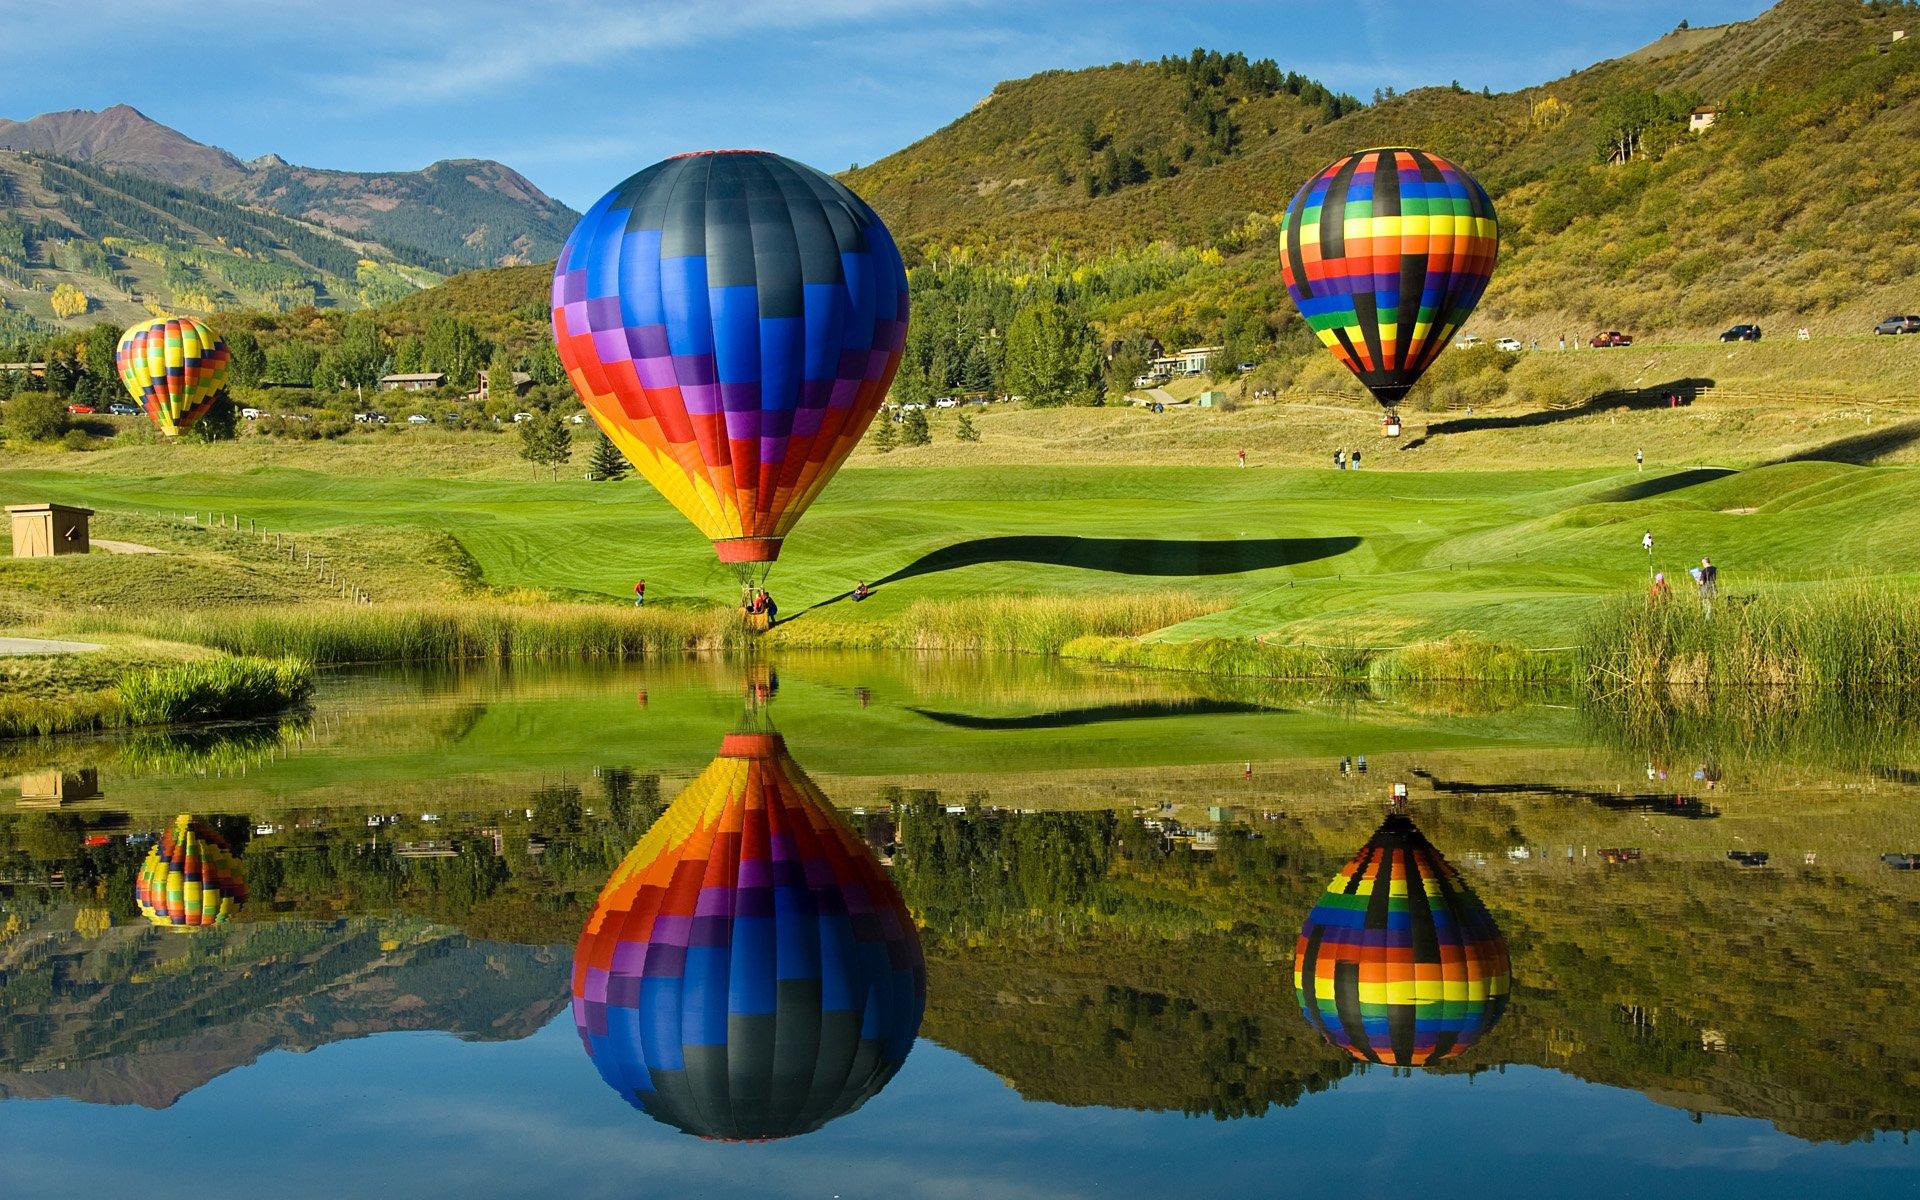 44+ HD Hot Air Balloon Wallpaper on WallpaperSafari